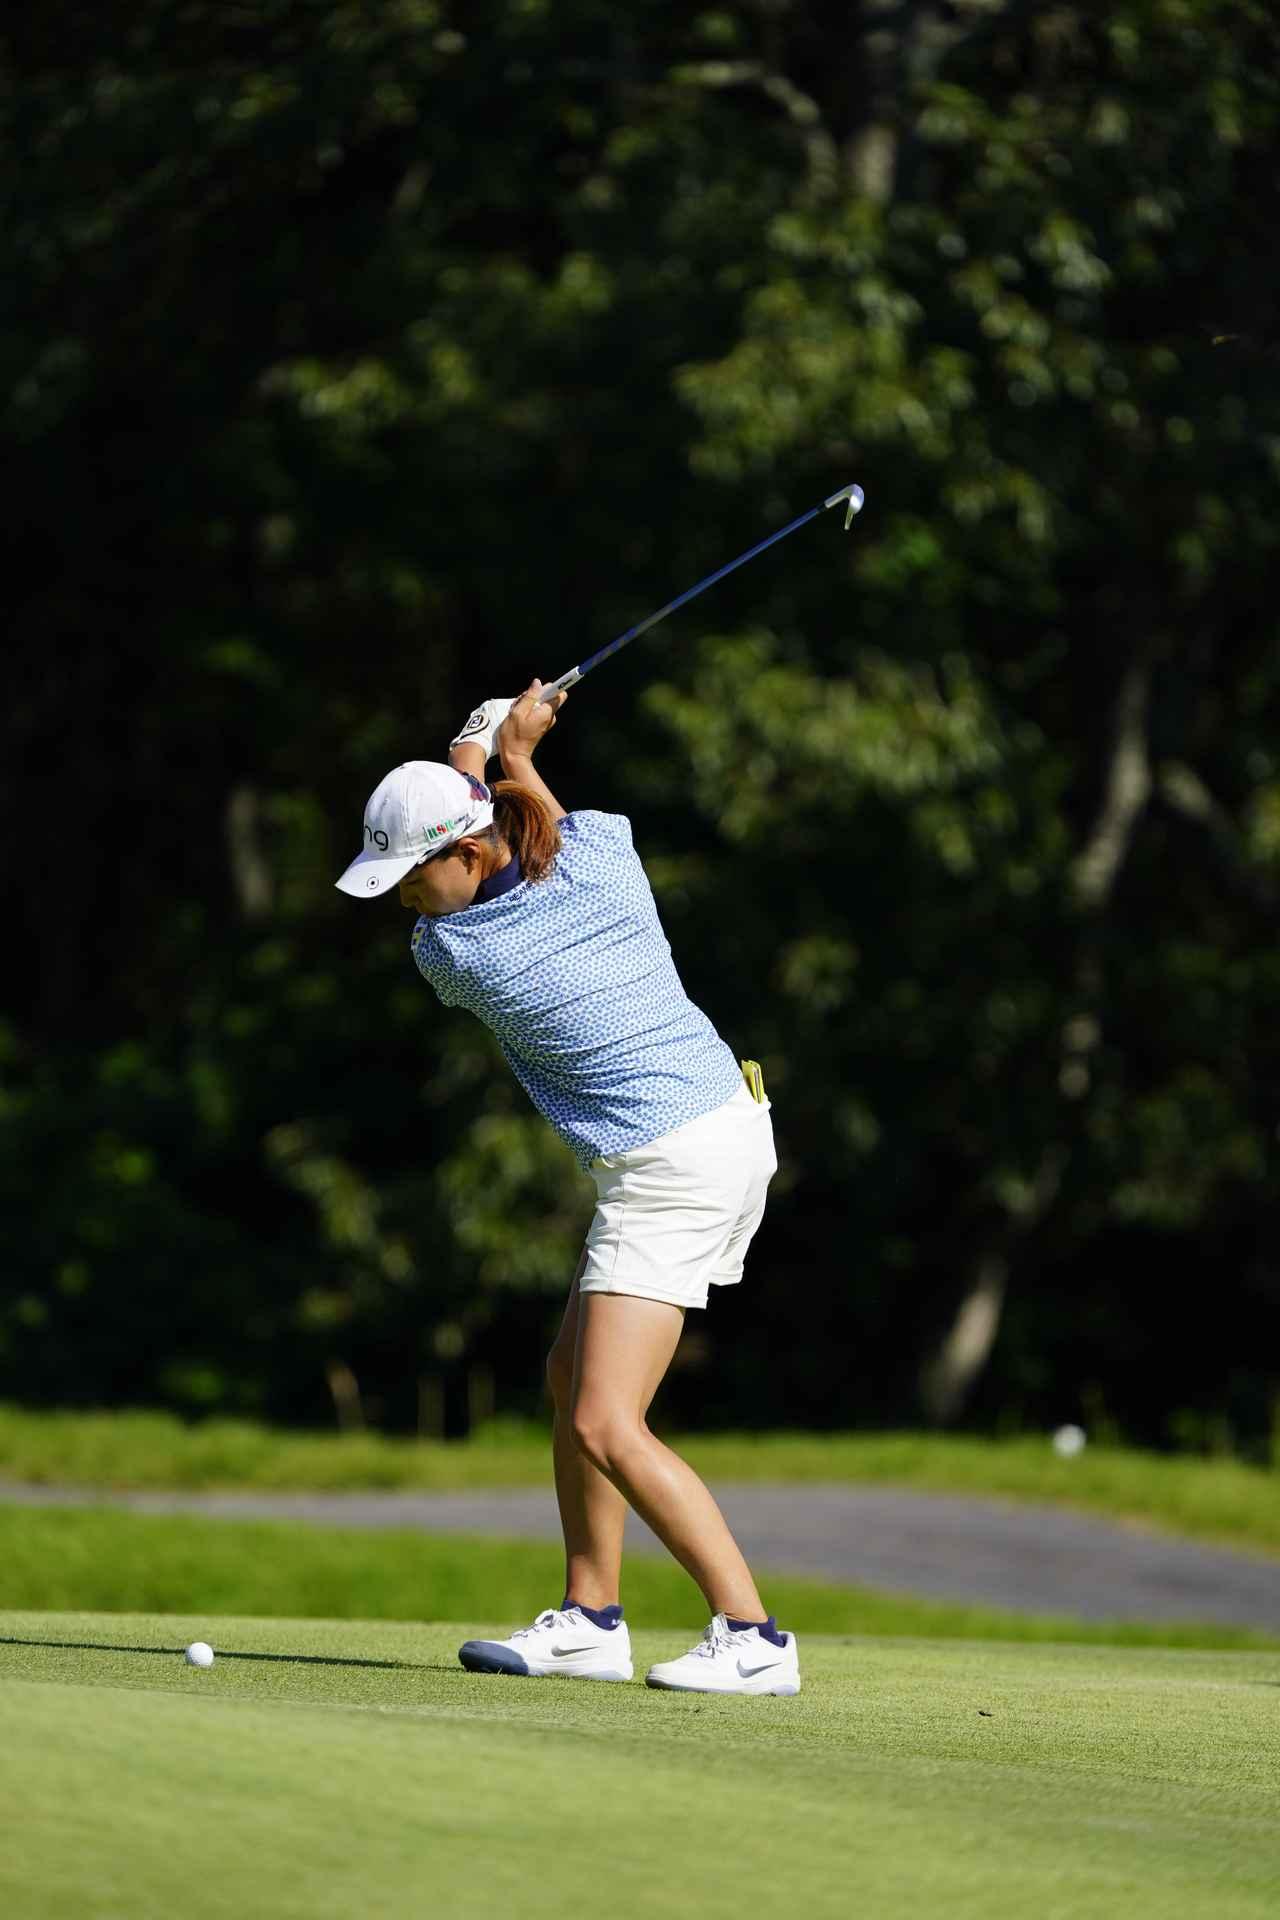 Images : 9番目の画像 - 渋野日向子 アイアン連続写真 - みんなのゴルフダイジェスト